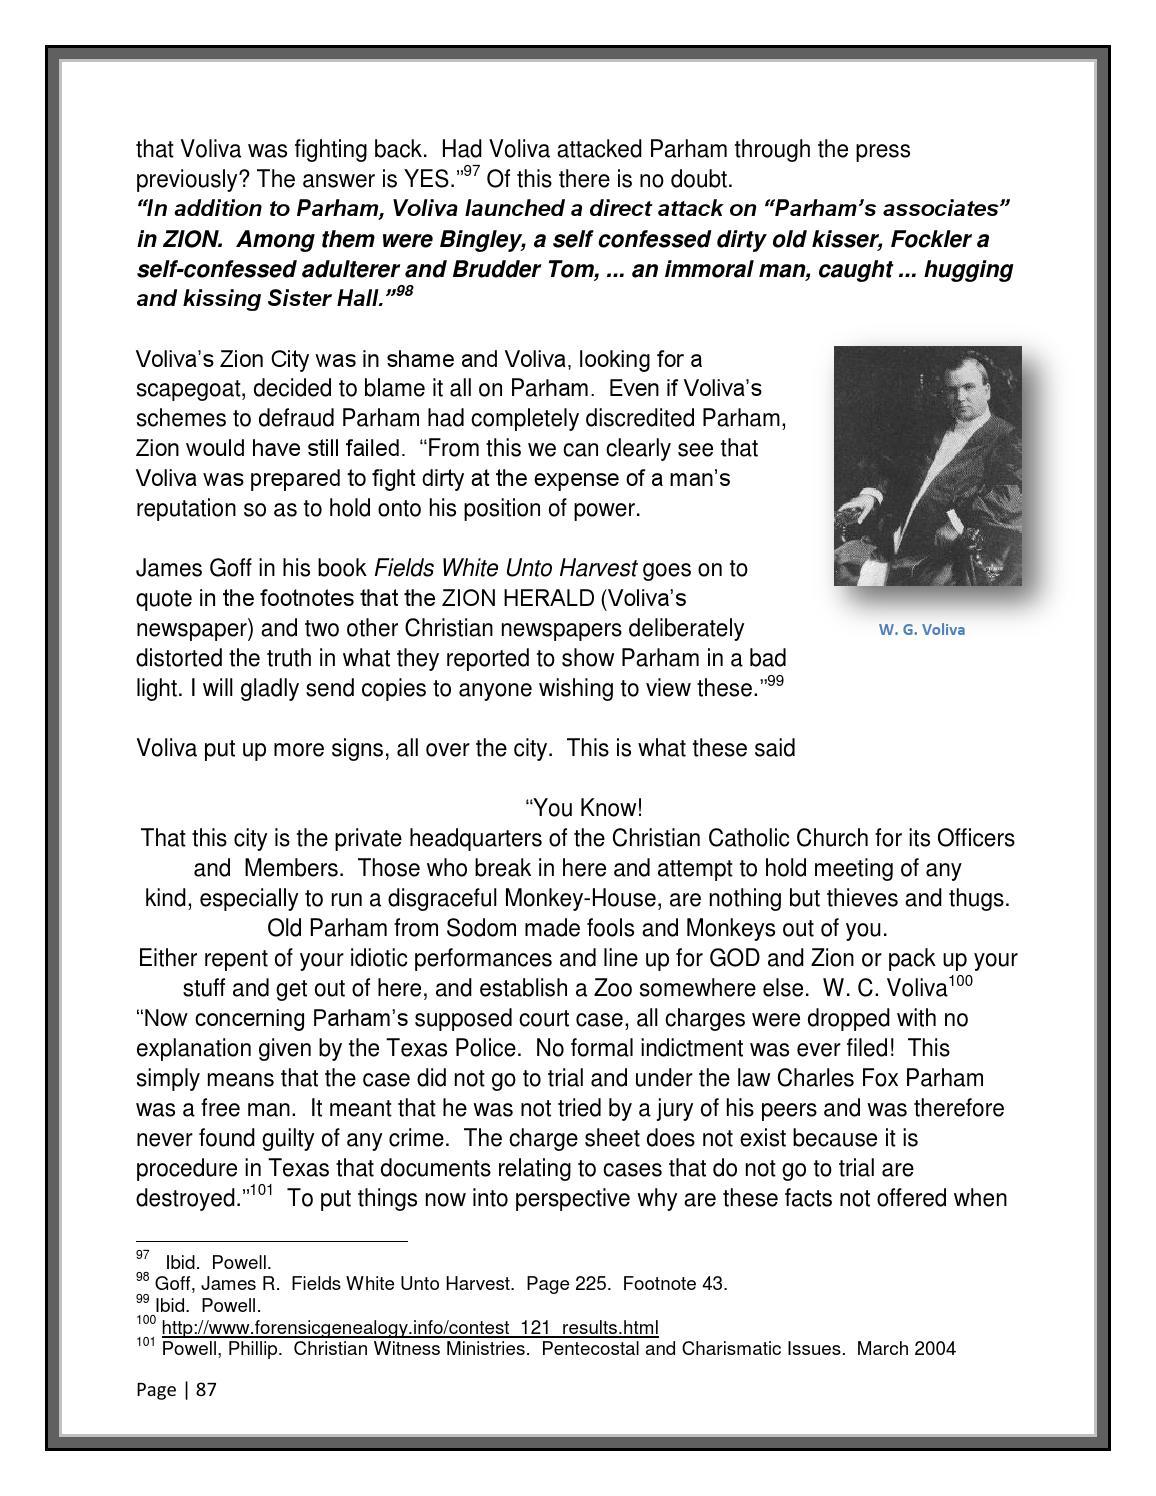 20th Century Apostolic Reformation Volume 1 by Life Network